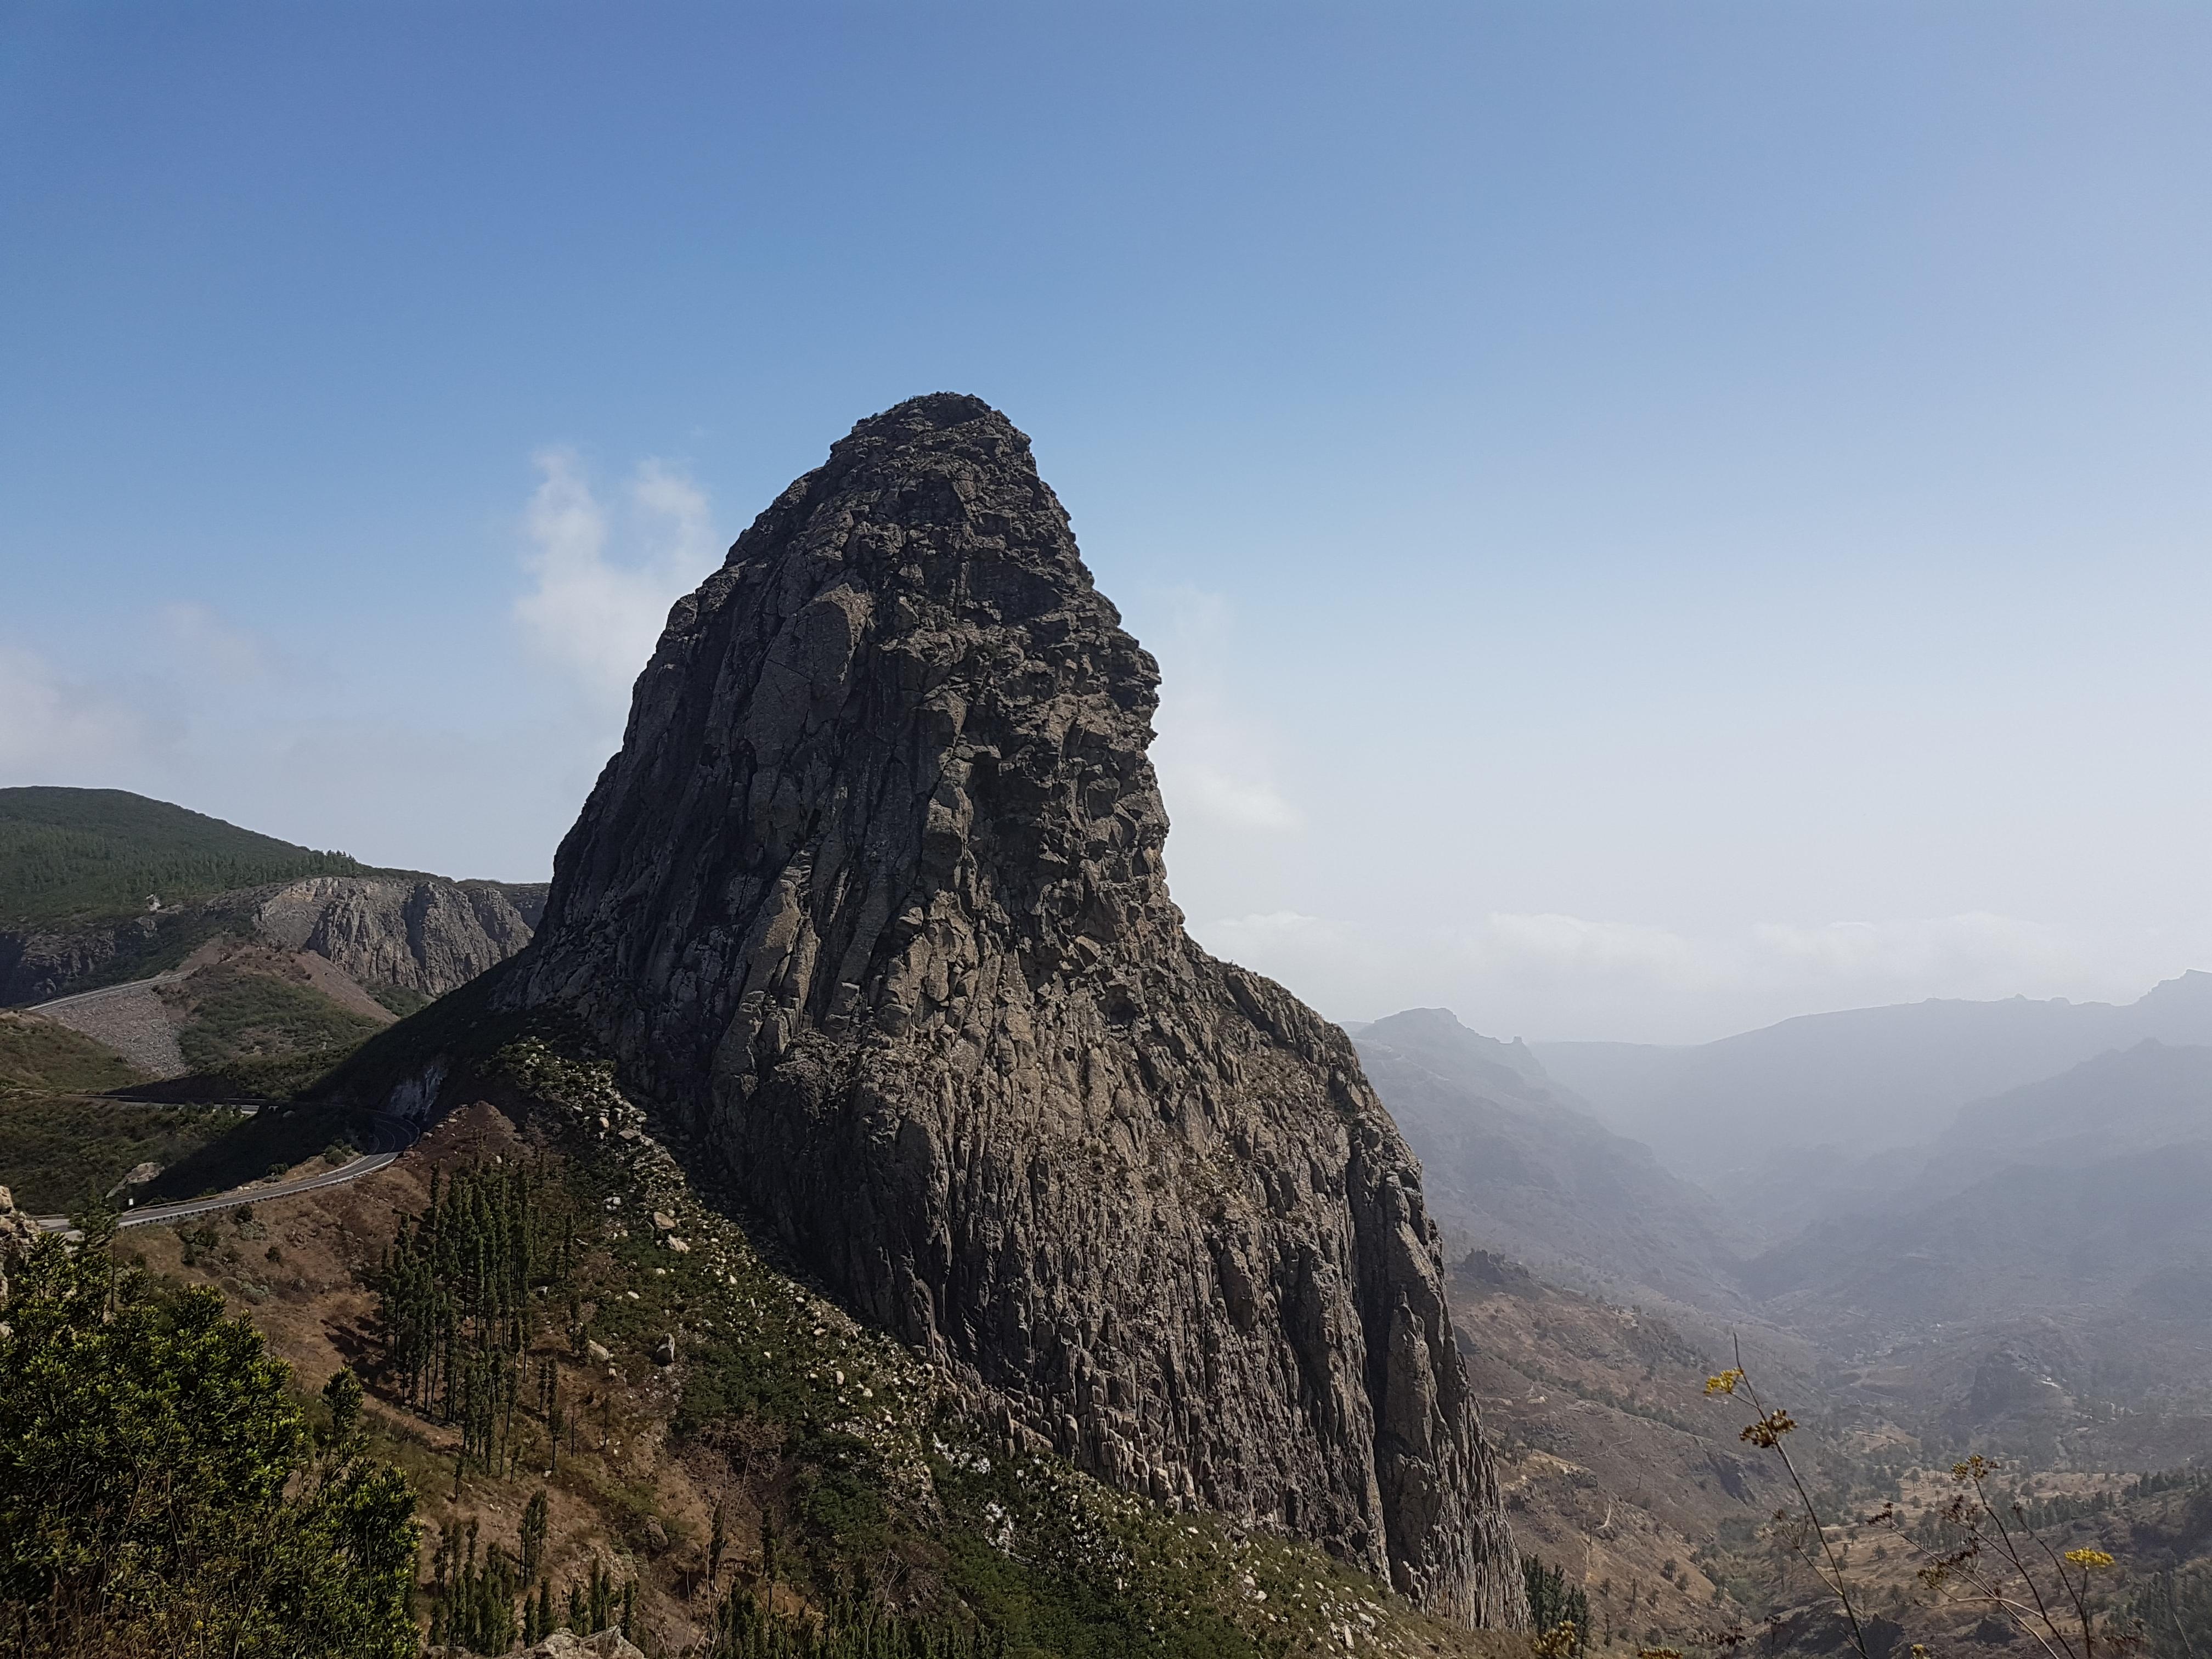 Aida Kreuzfahrt Kanaren und Madeira -La Gomera - Roque de Agando